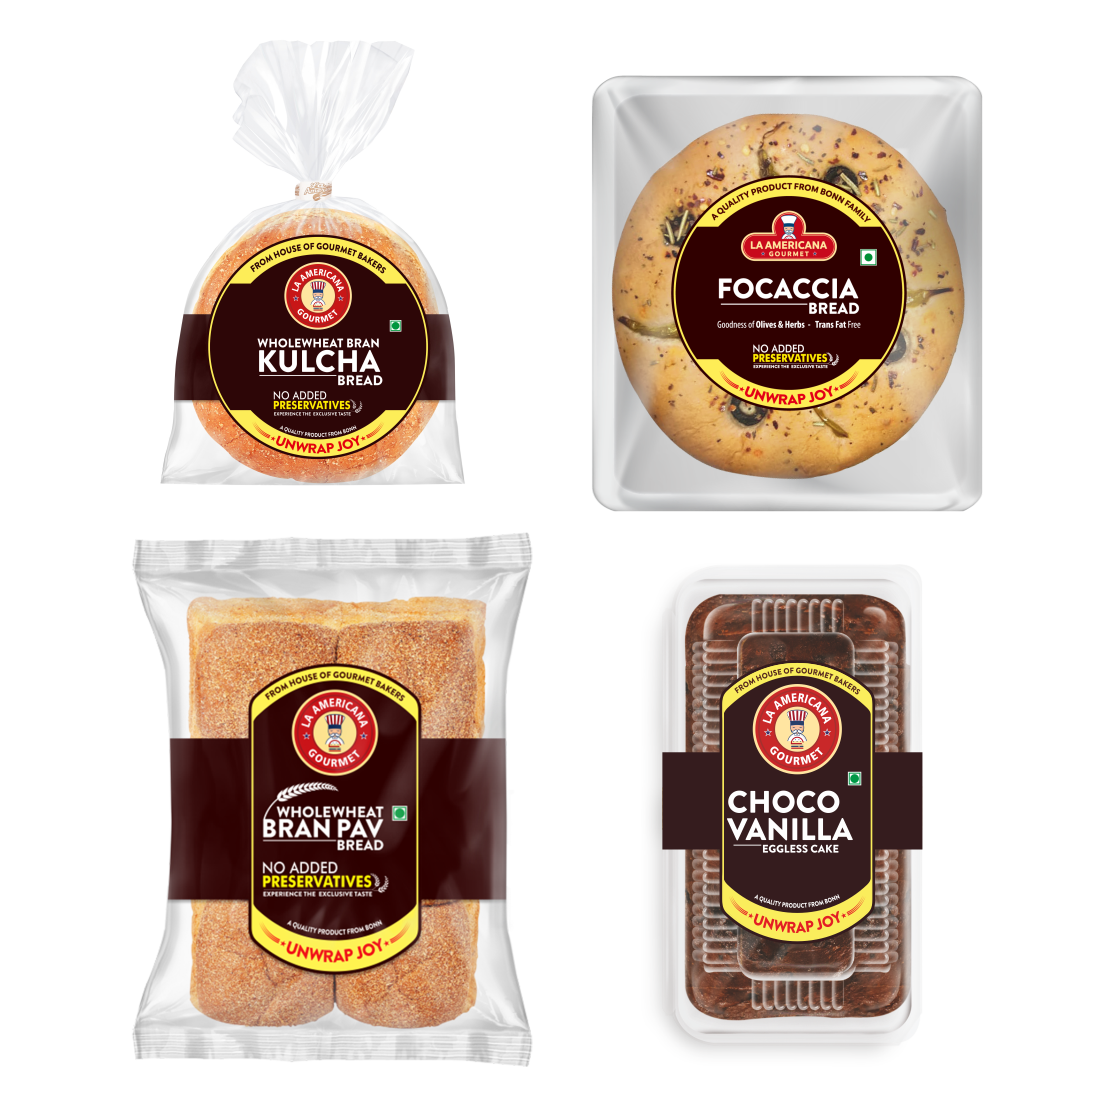 LA Americana wholewheat Bran Kulcha bread 200g, Focaccia Bread 100g, Wholewheat Bran Pav 250g and Eggless Choco Vanilla Cake 200g (Pack of 1 Each)